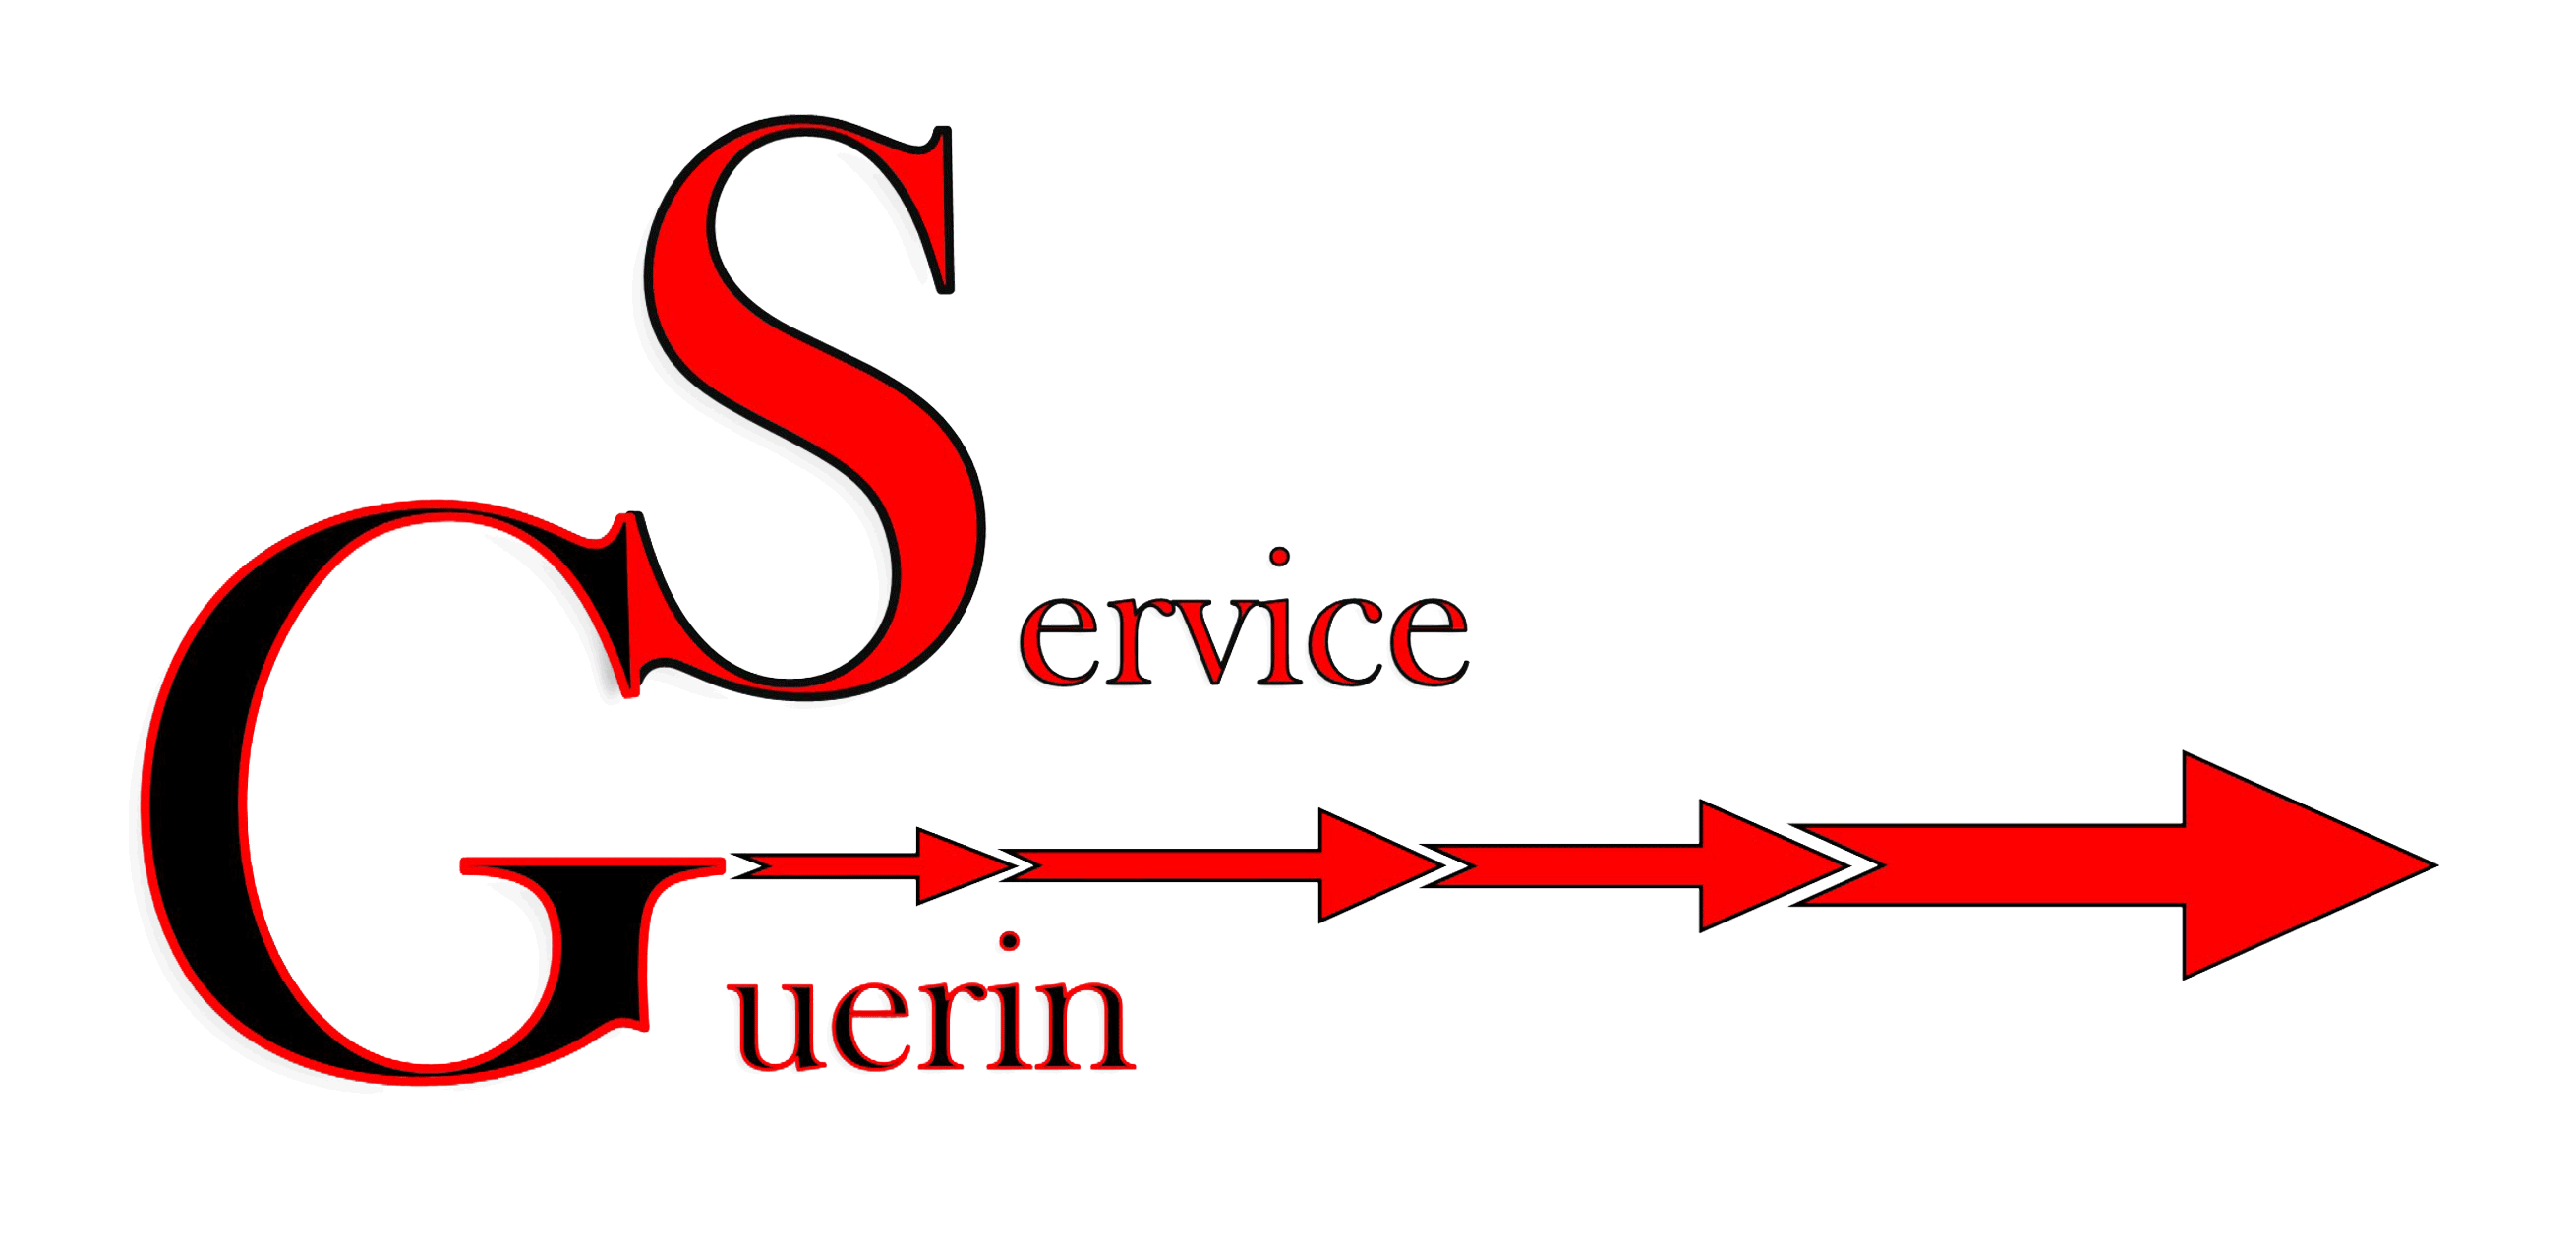 Guerin Service